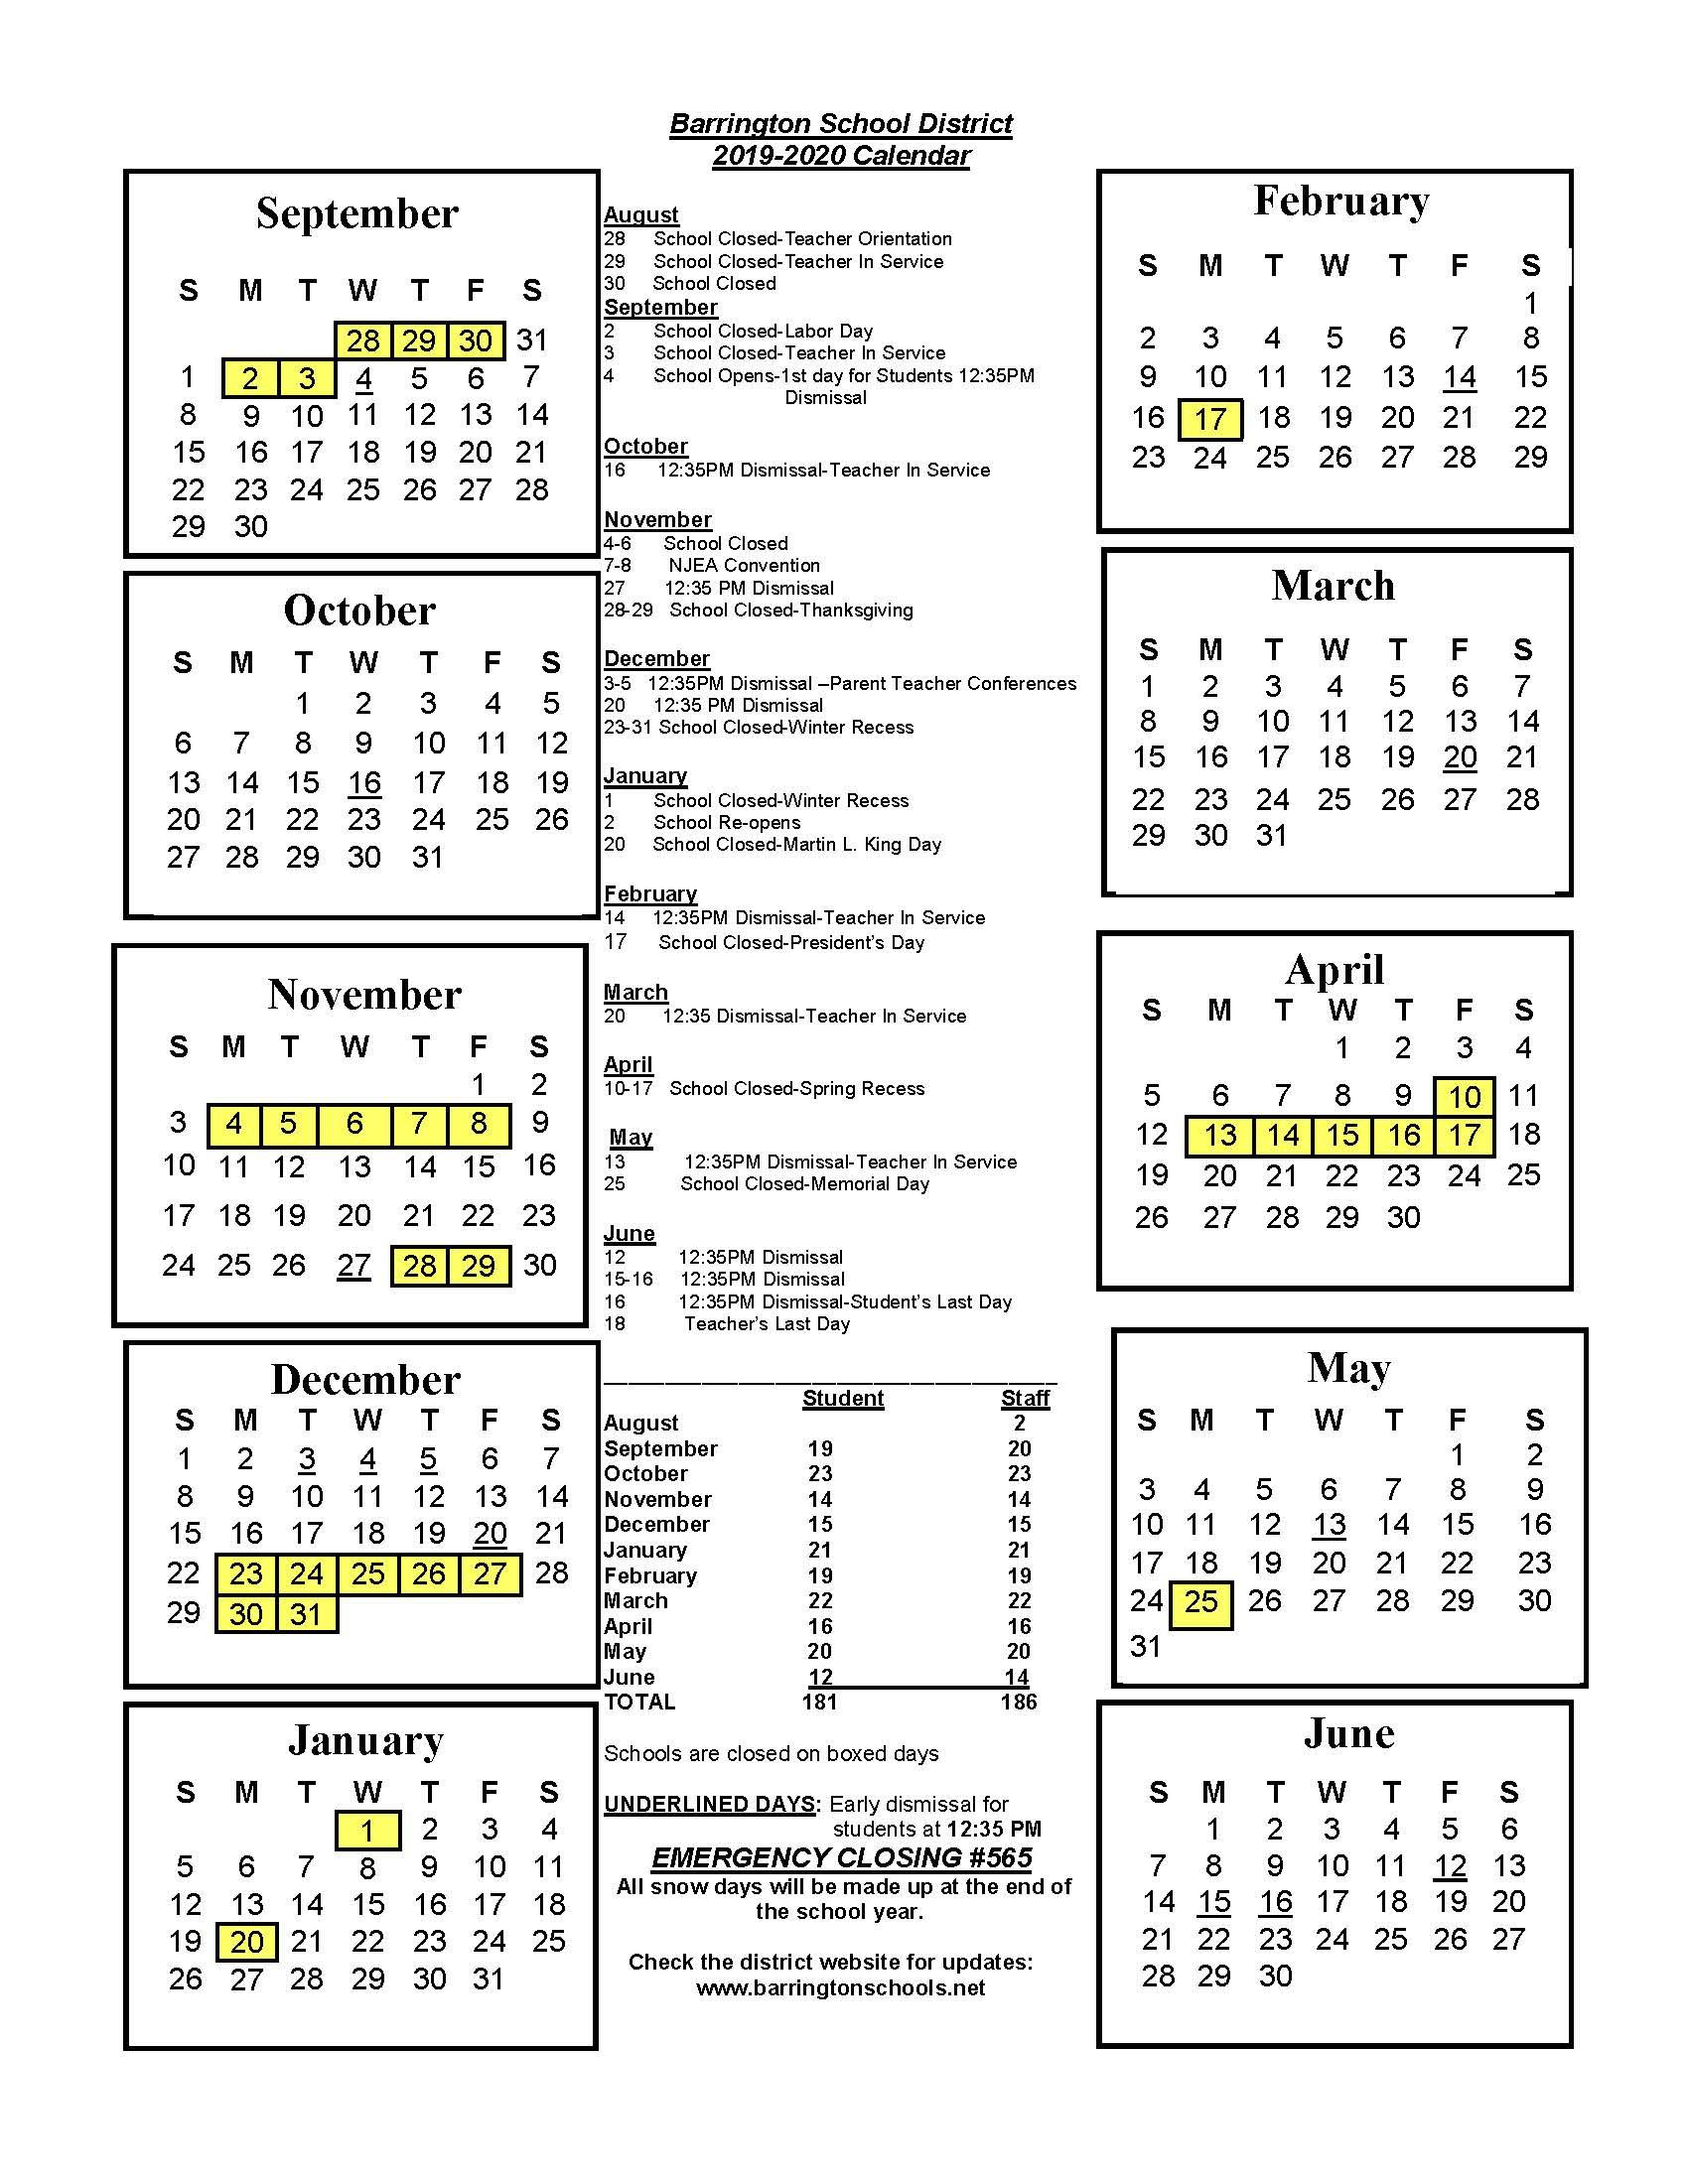 District Calendar – Barrington School District Regarding Delaware County Community College Academic Calendar 2021